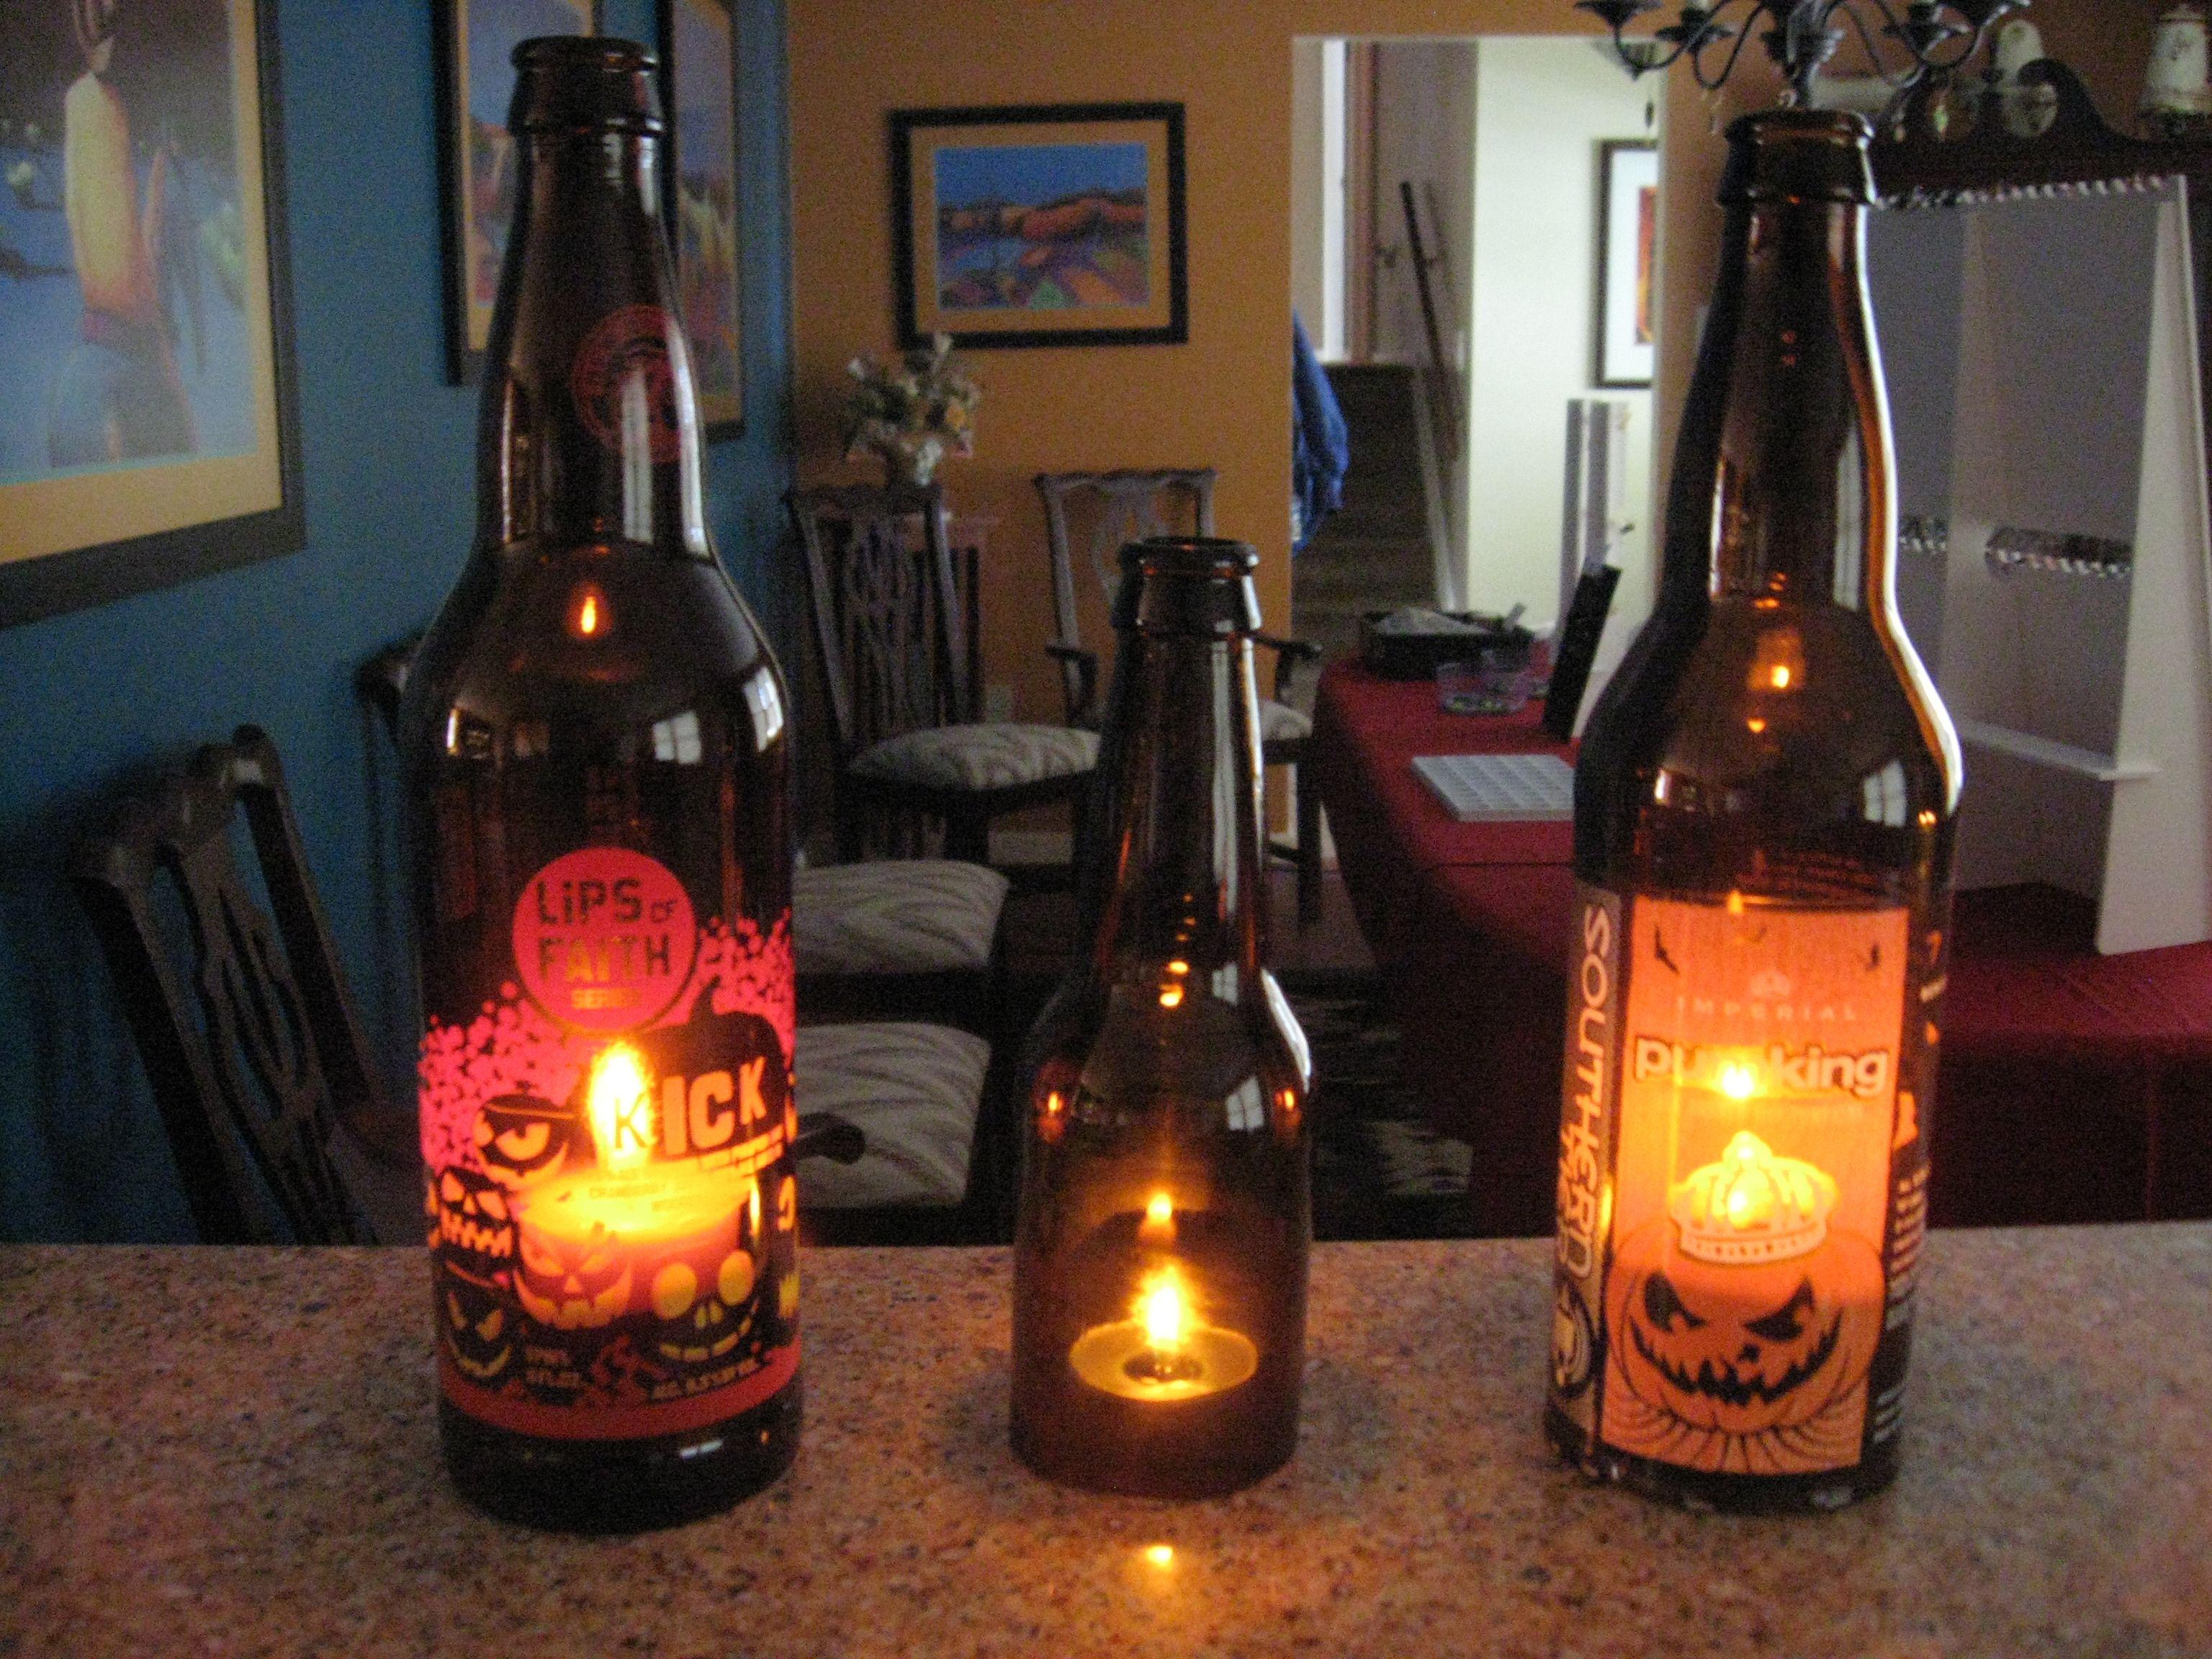 Beer Bottle Decoration Carving And Illuminating Pumpkin Beer Bottles For Halloween  Beer